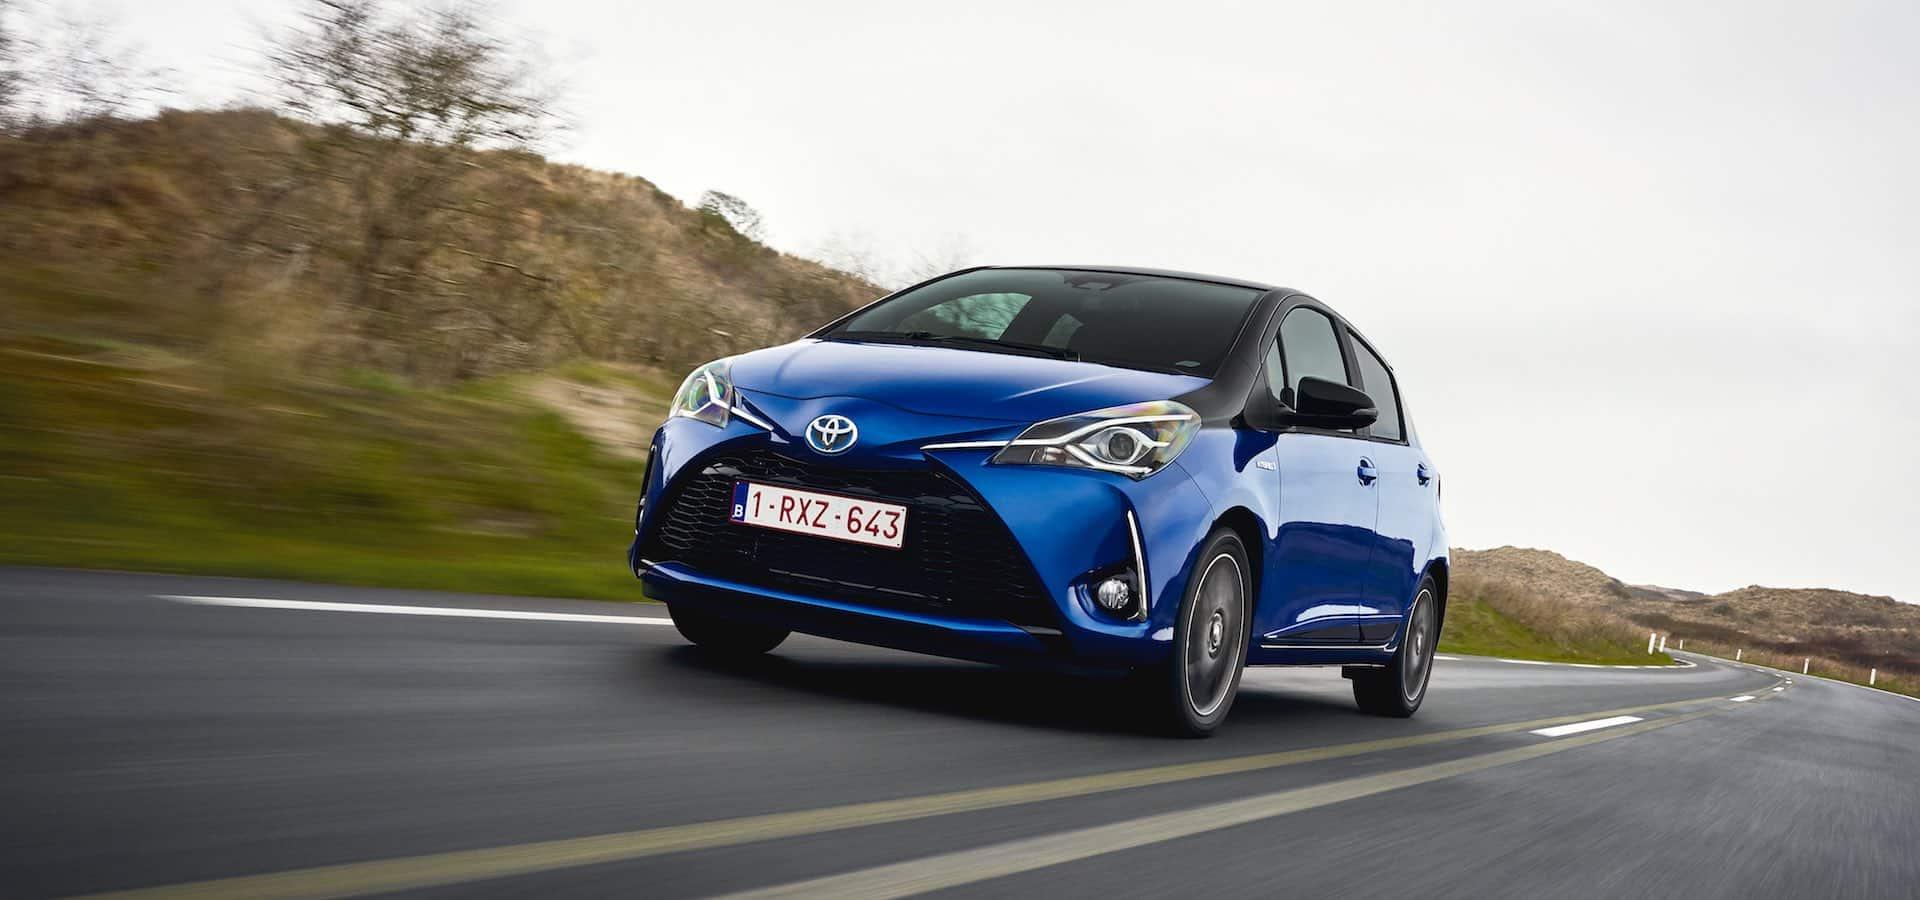 Toyota Yaris Hybrid test drive | car reviews 2018 | The Car Expert